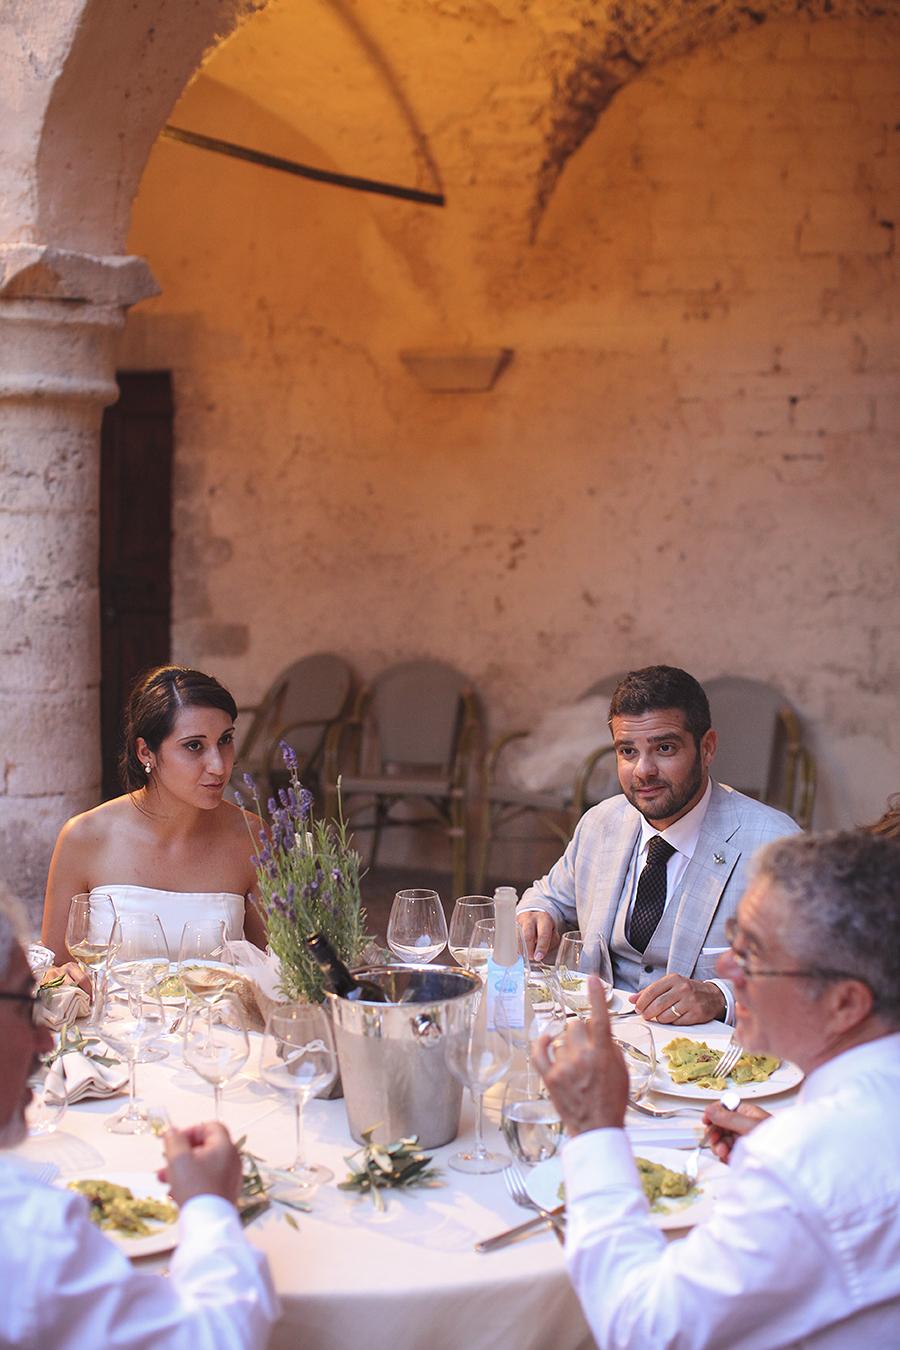 italy wedding photography by kurt ahs . alex + silvia ( washington united states ) . 7400.jpg